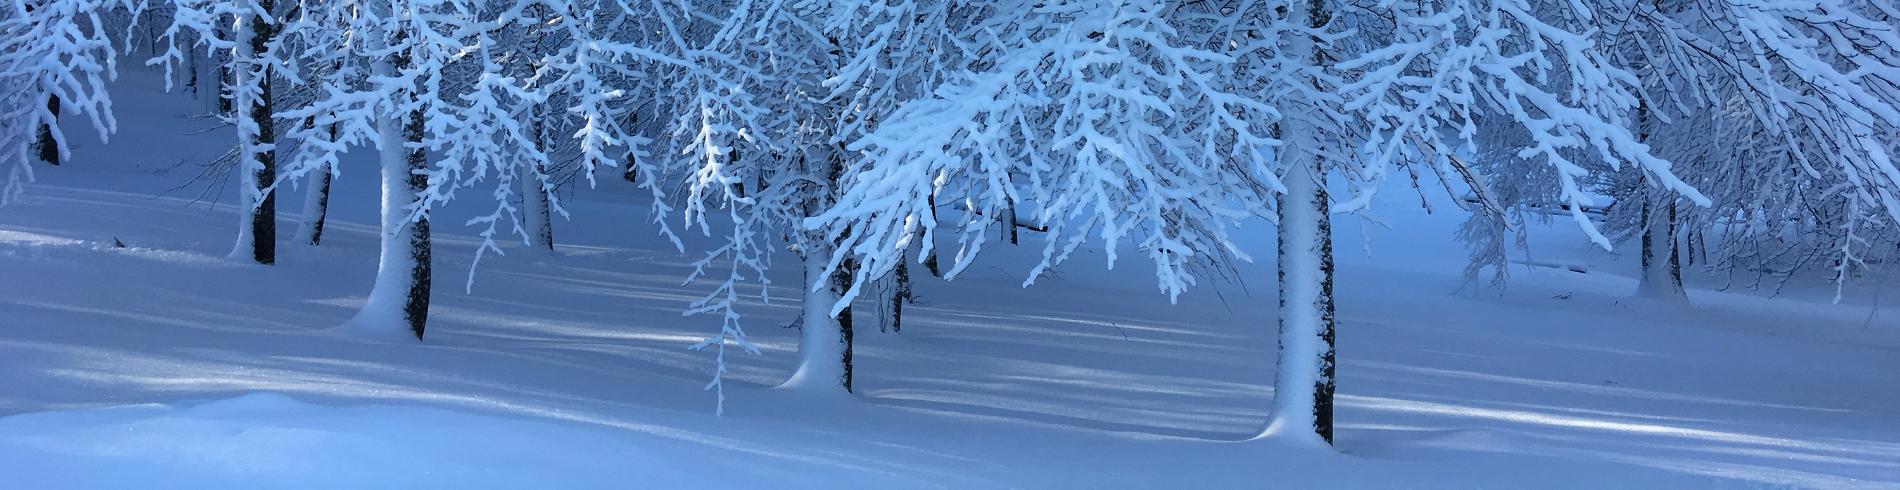 Bildebank Larvik kommune cover image